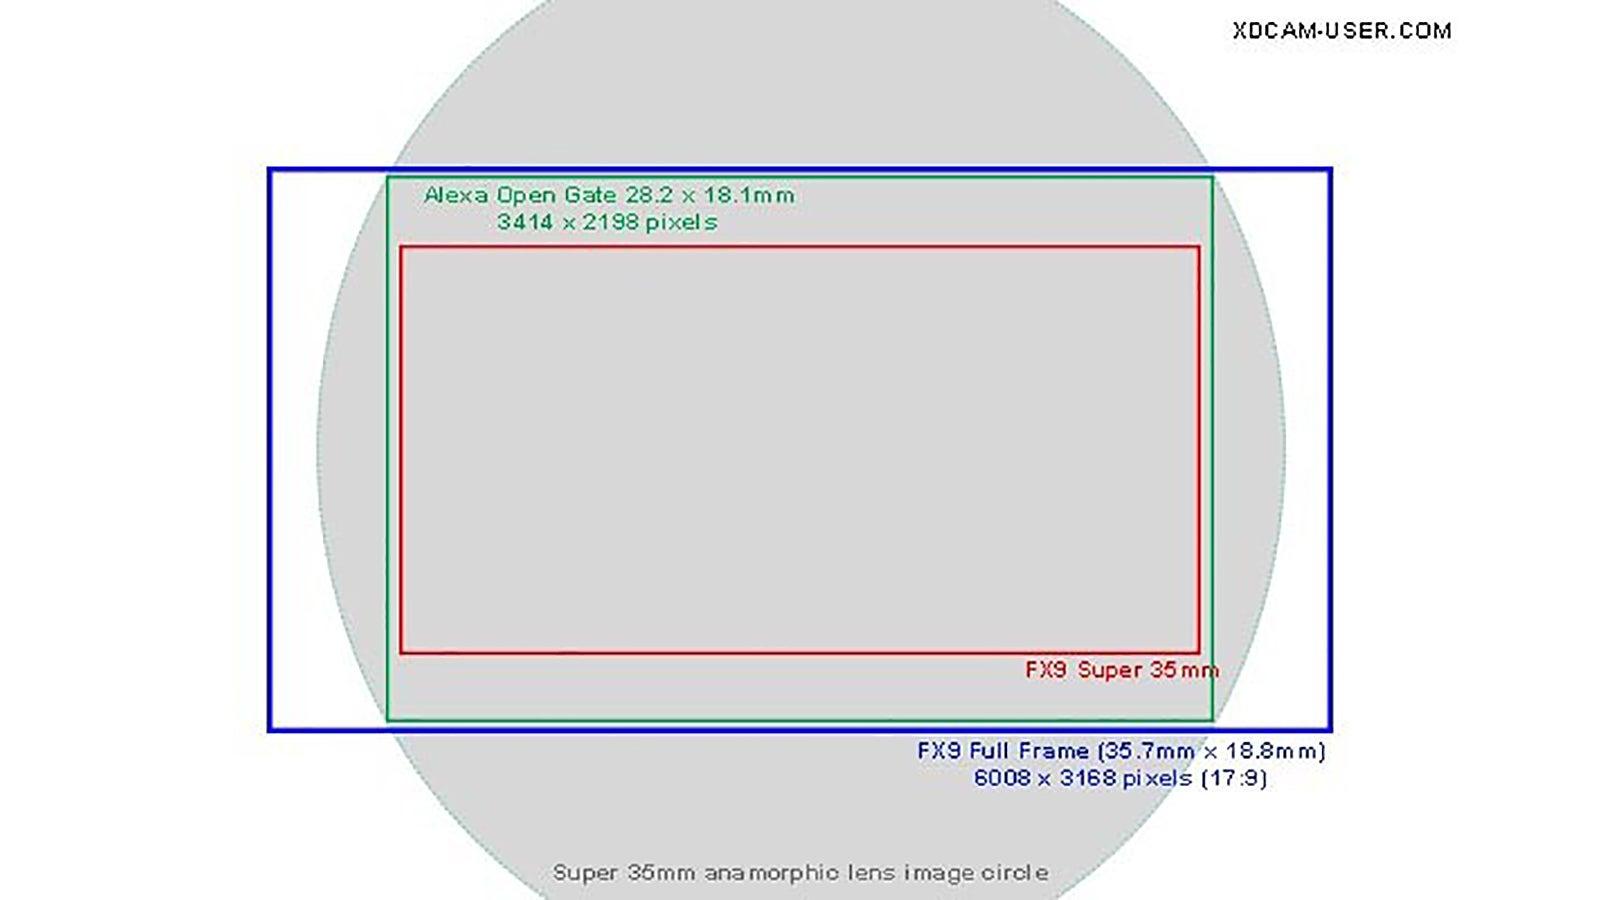 FX9-Image-circle-frame-lines1-1600.jpg